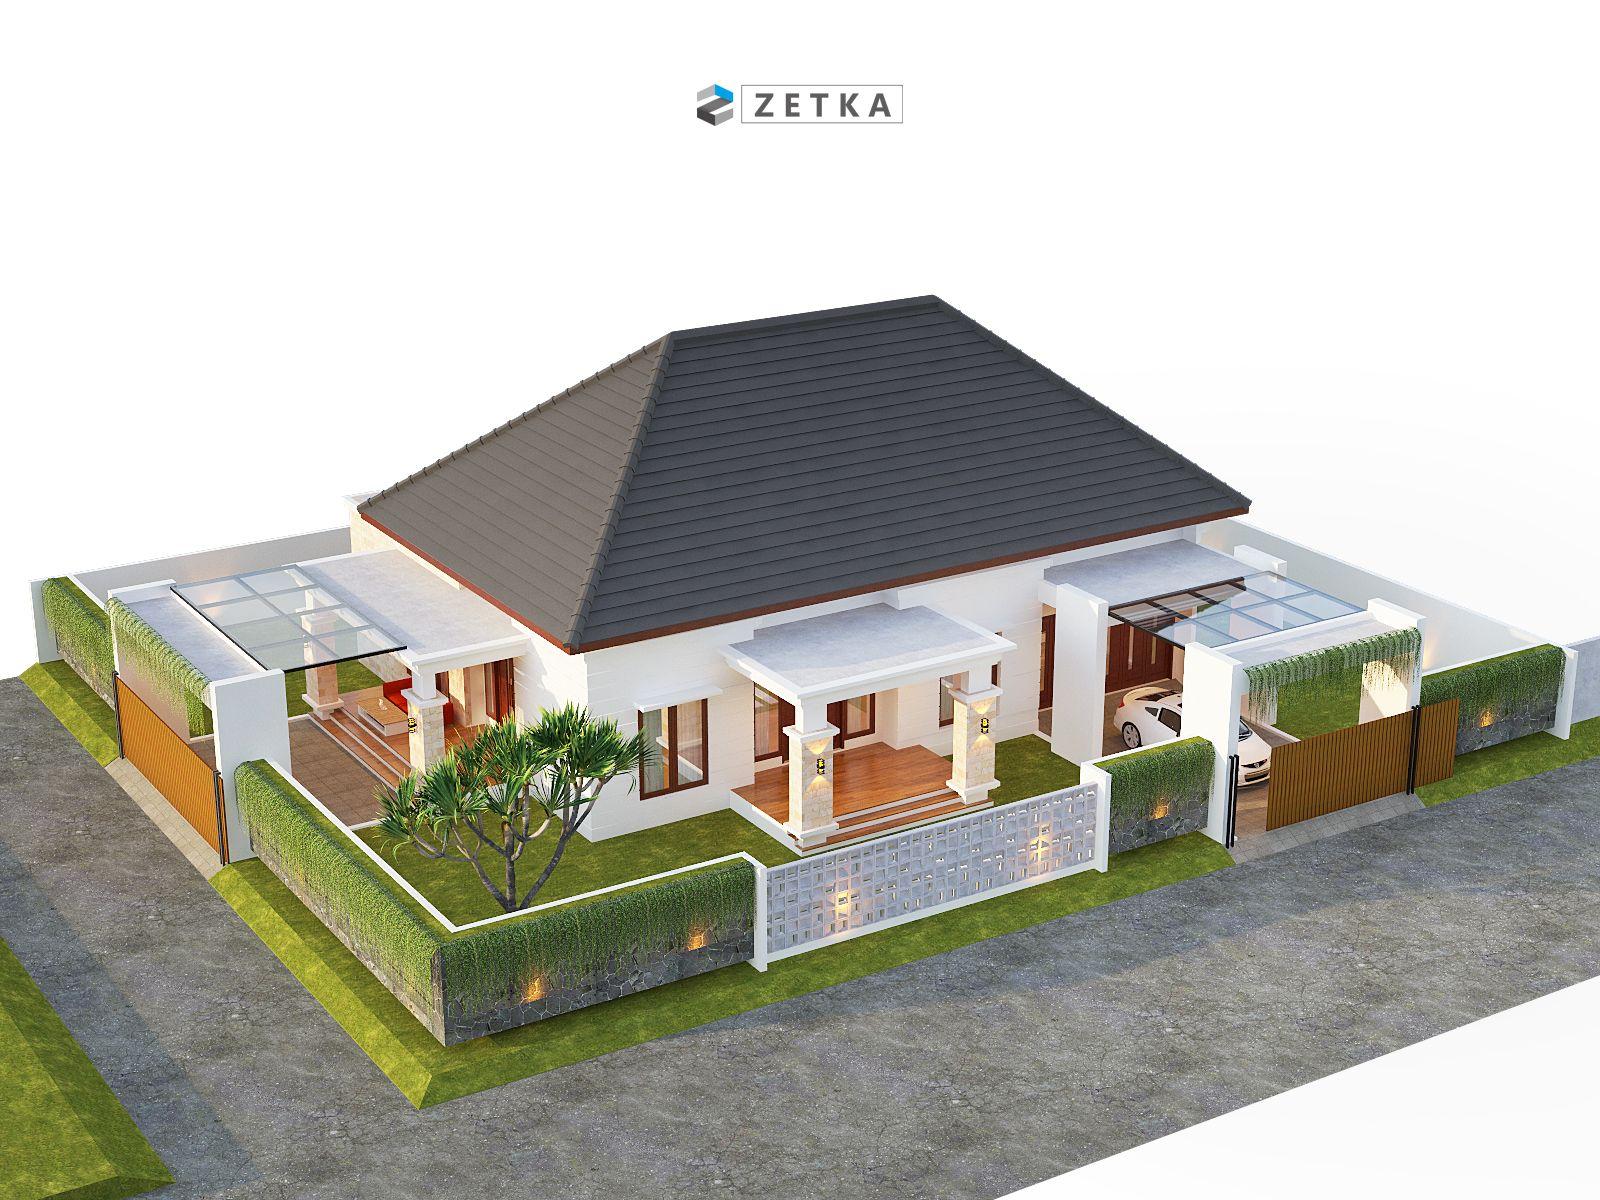 Pin Oleh Zetka Arsitek Di Anjas House Palangkaraya Denah Rumah Pedesaan Rumah Rumah Kebun